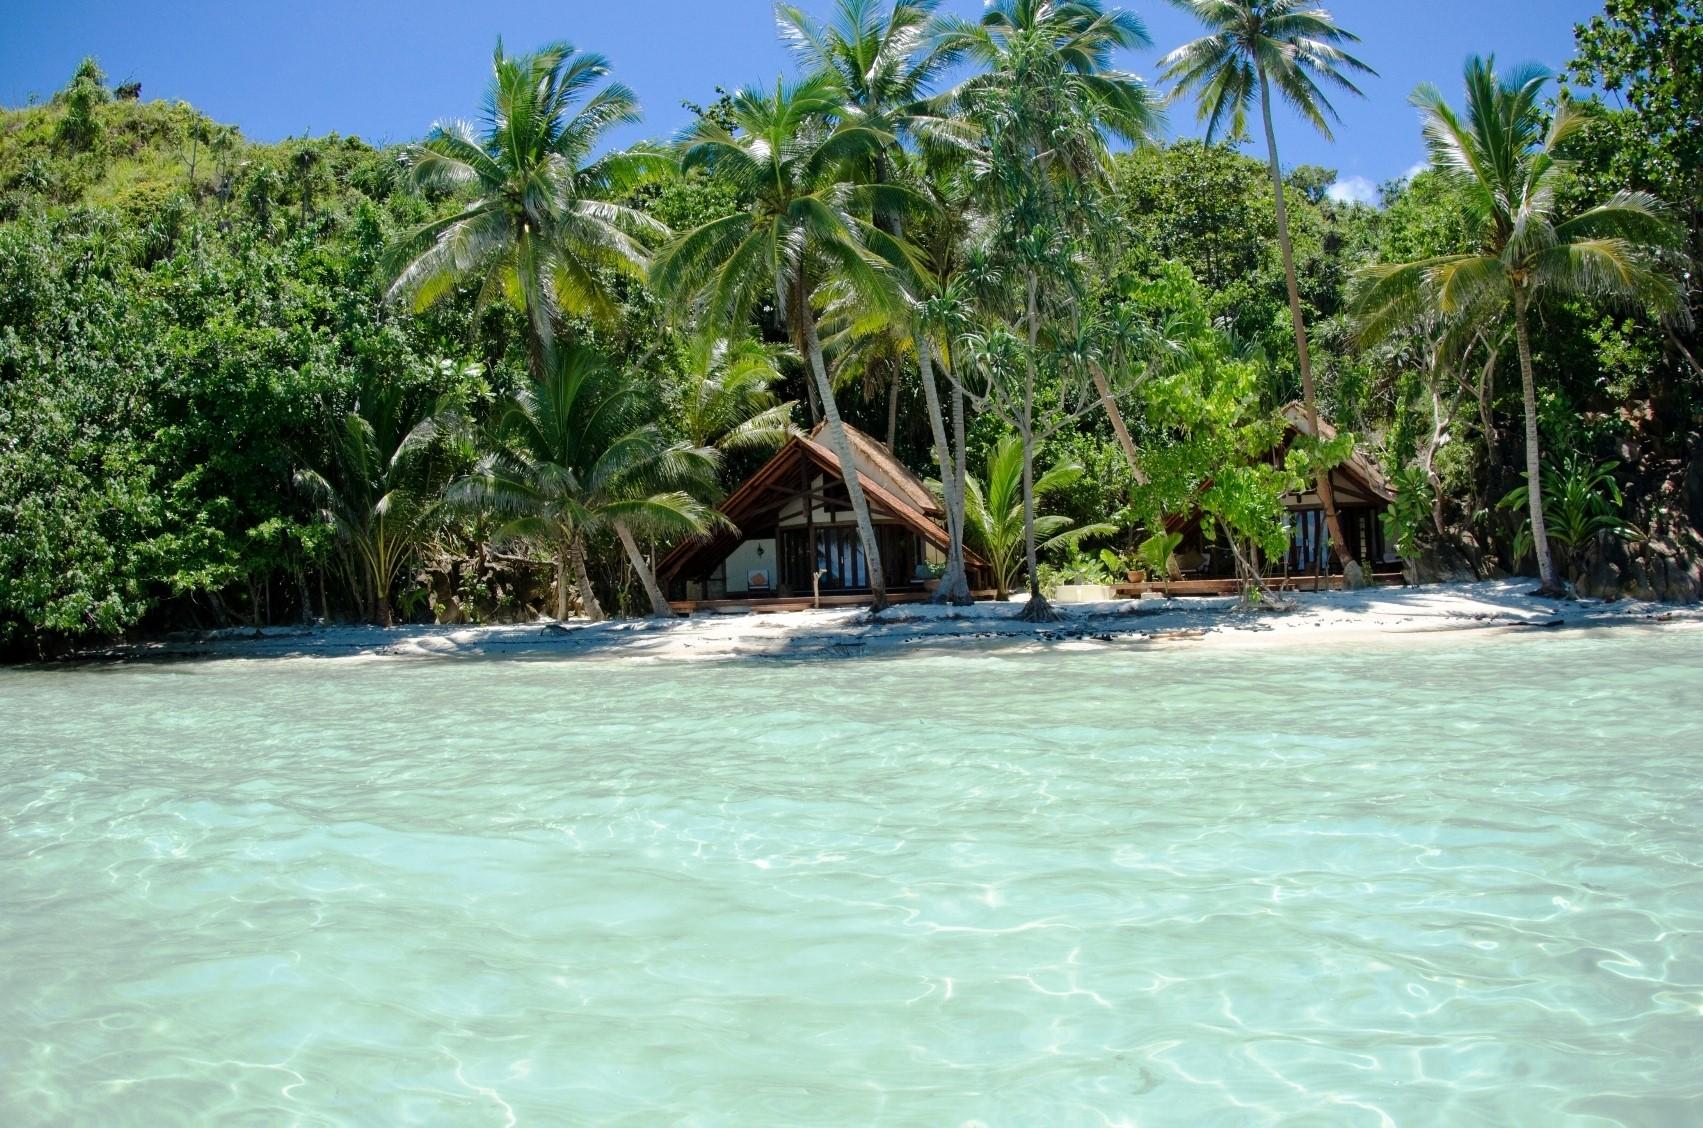 Luxury holidays to raja ampat islands indonesia luxury for Hotel luxury definicion